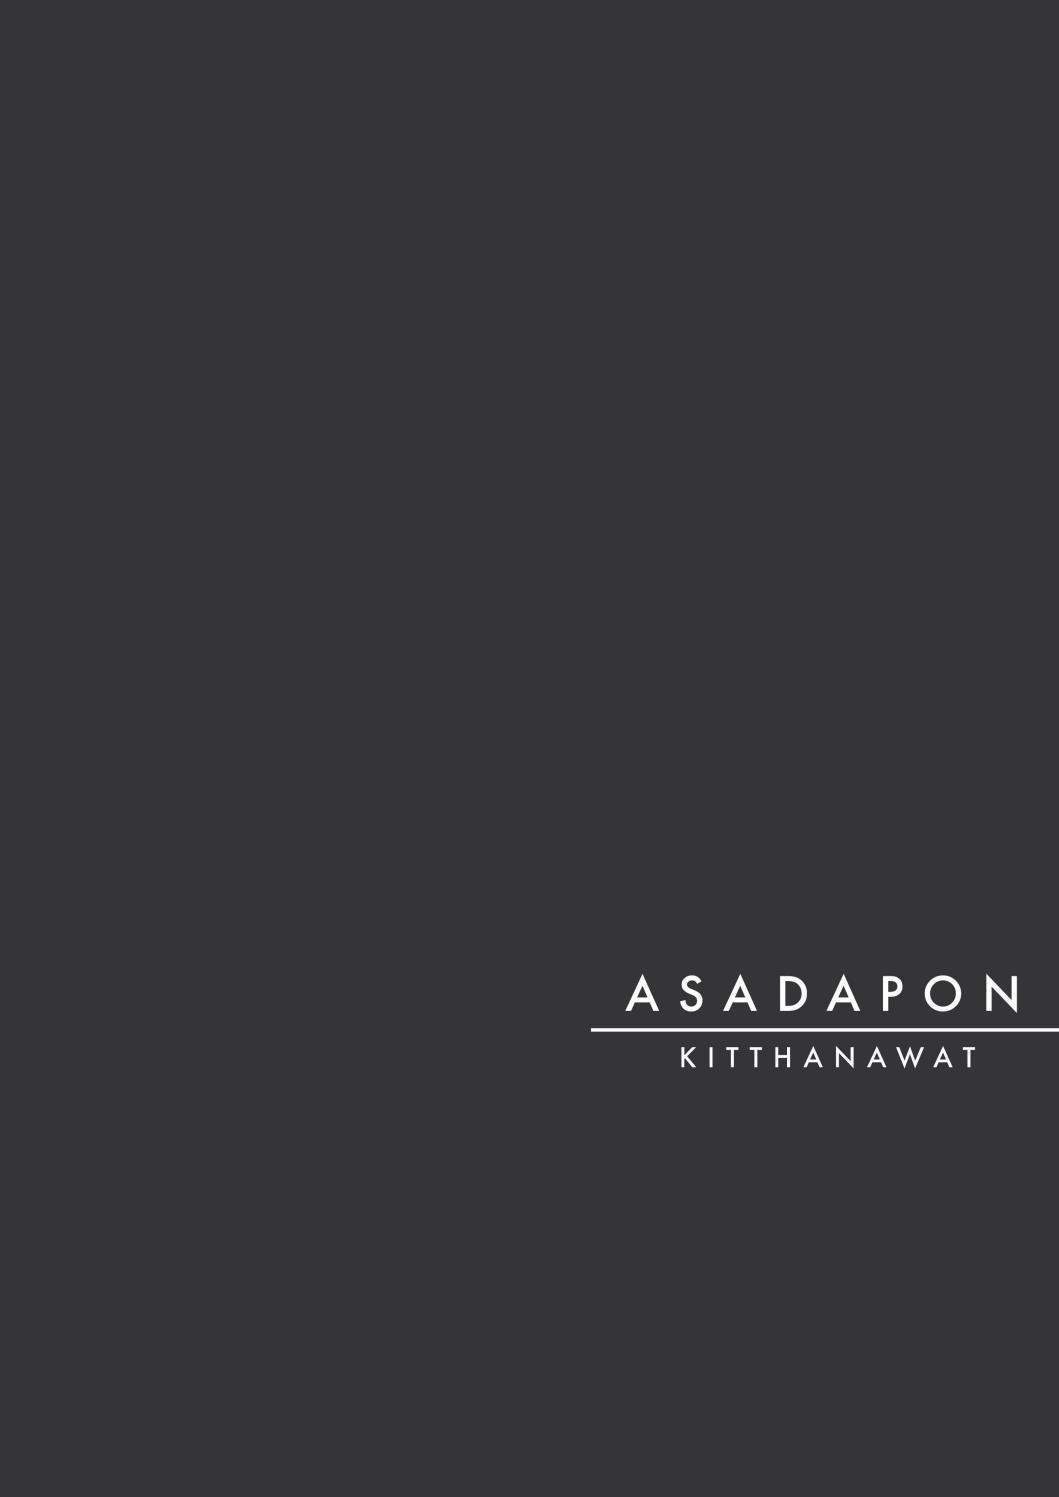 Portfolio - Asada Aui - Graphic Design - Food Hub - 5 Star